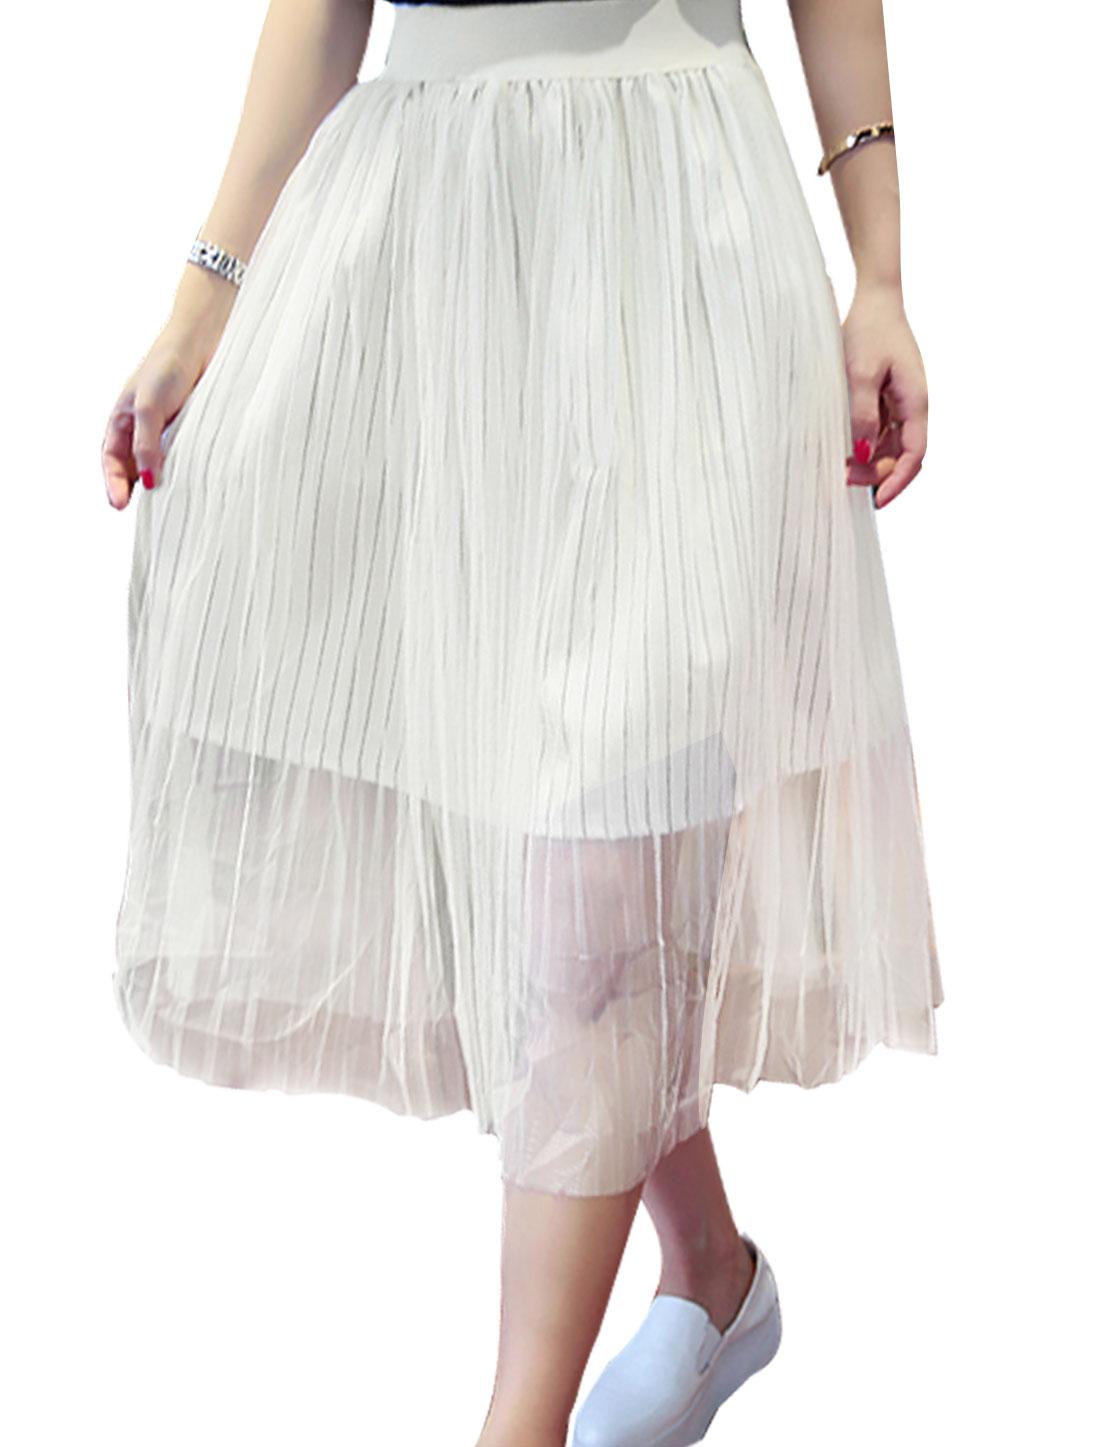 Women Mid Rise Elastic Waist Fully Lined Leisure Mesh Skirts White M